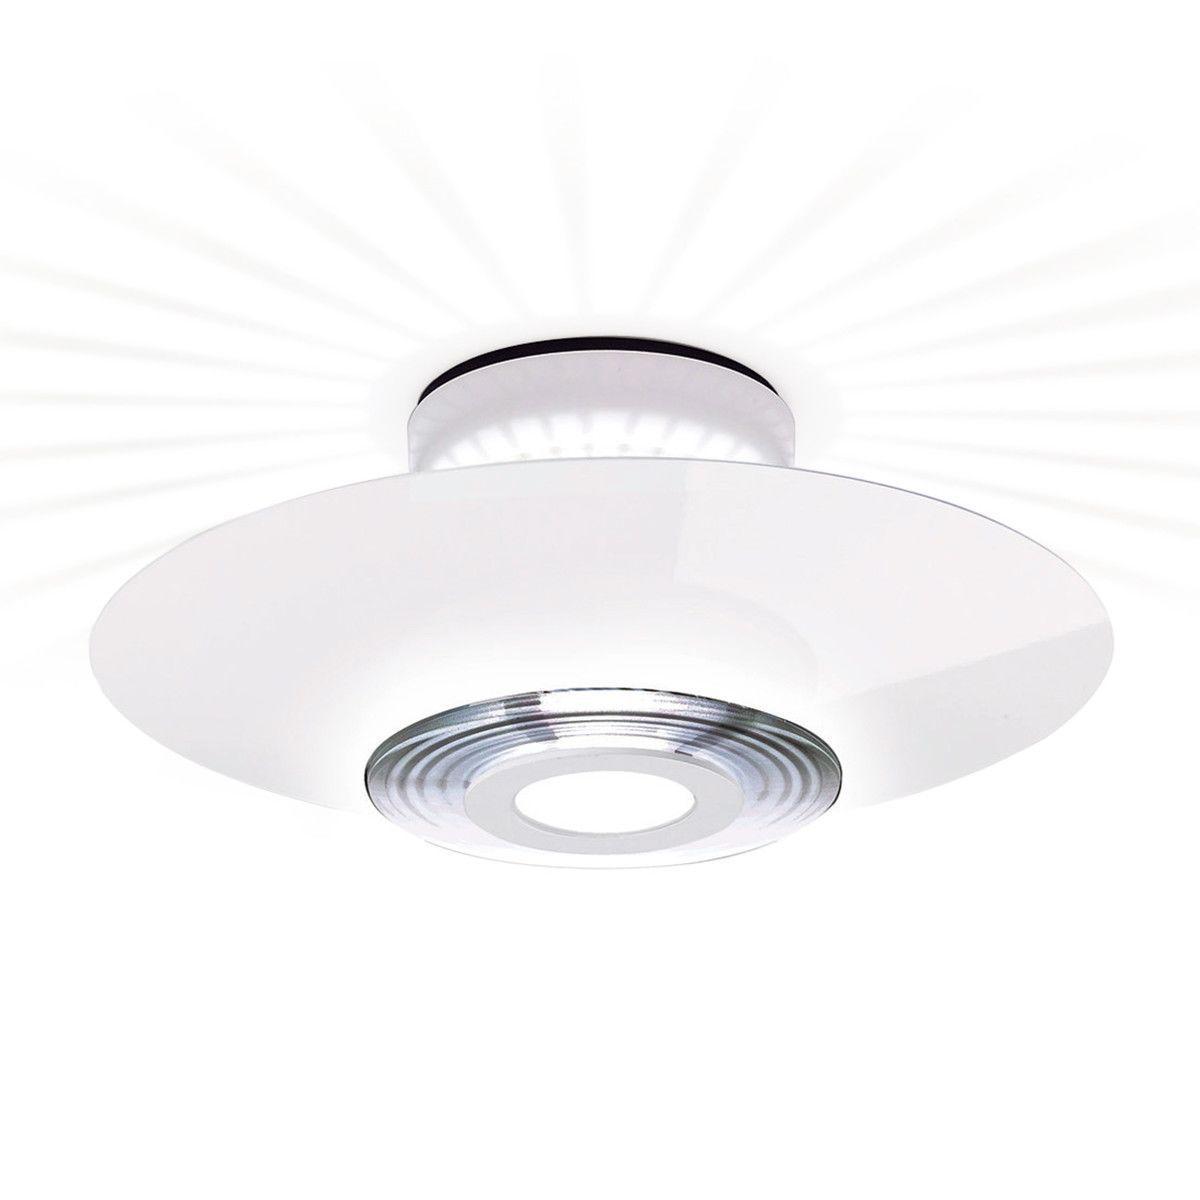 Moni Plafon Lamp